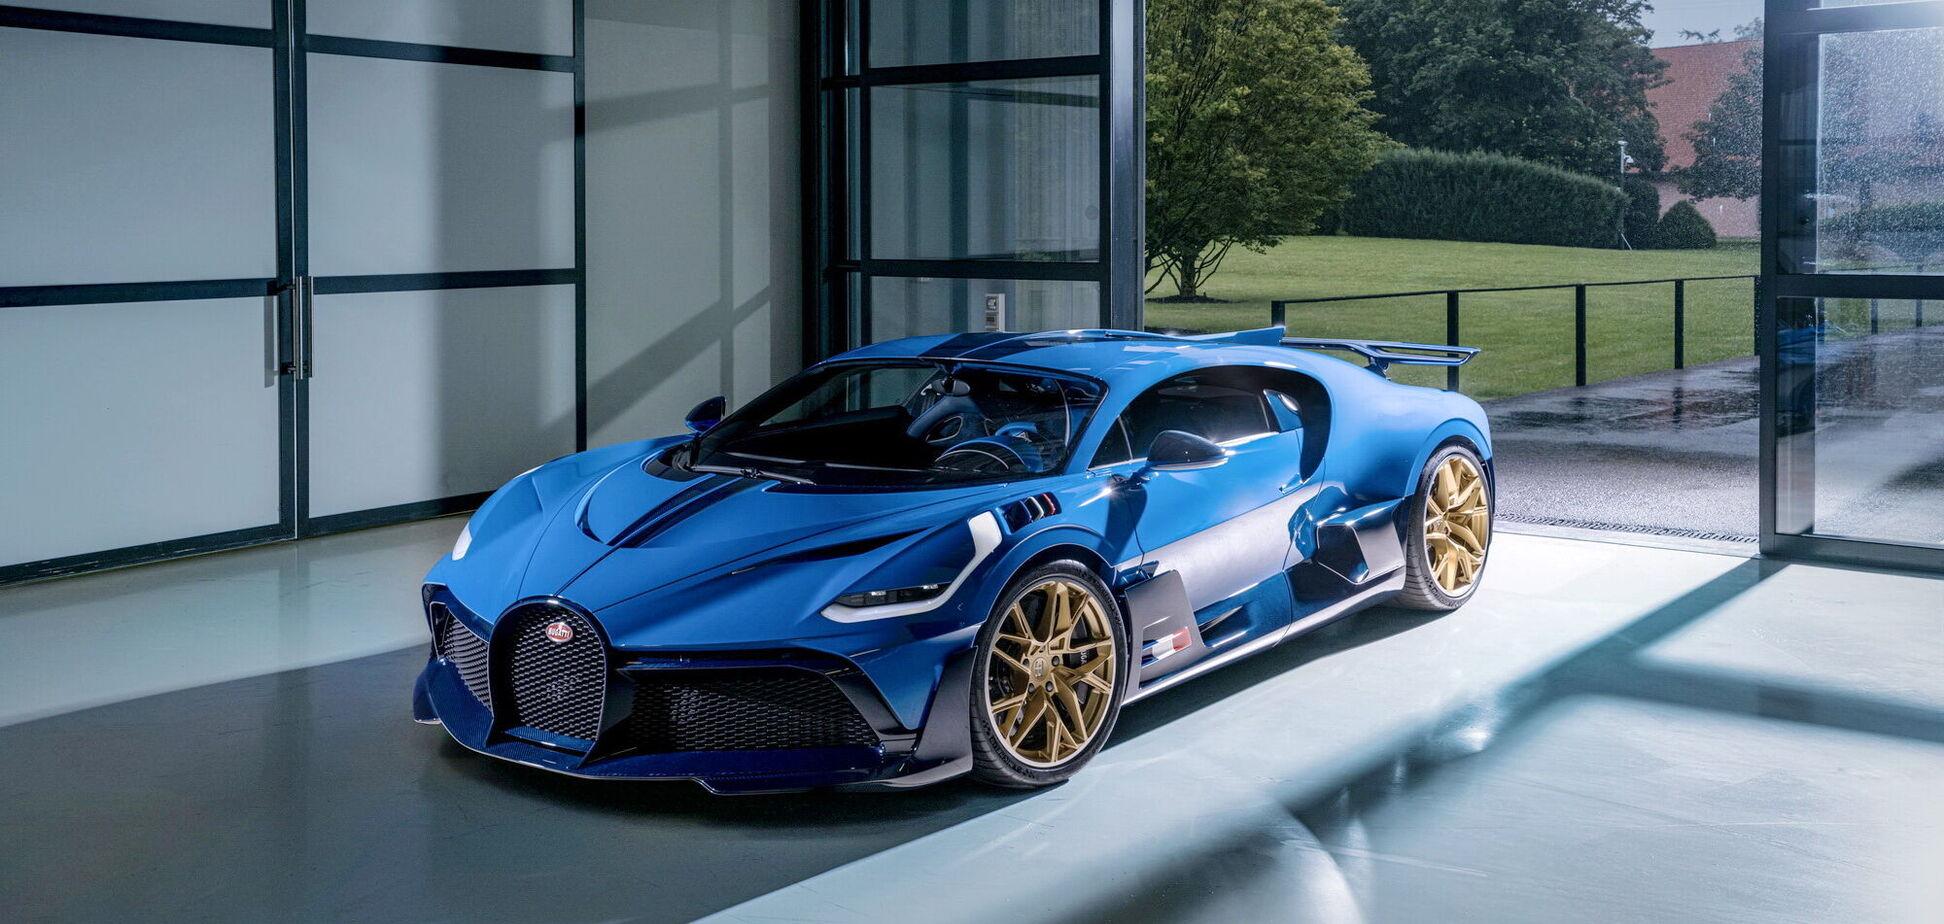 К заказчику отправился последний гиперкар Bugatti Divo